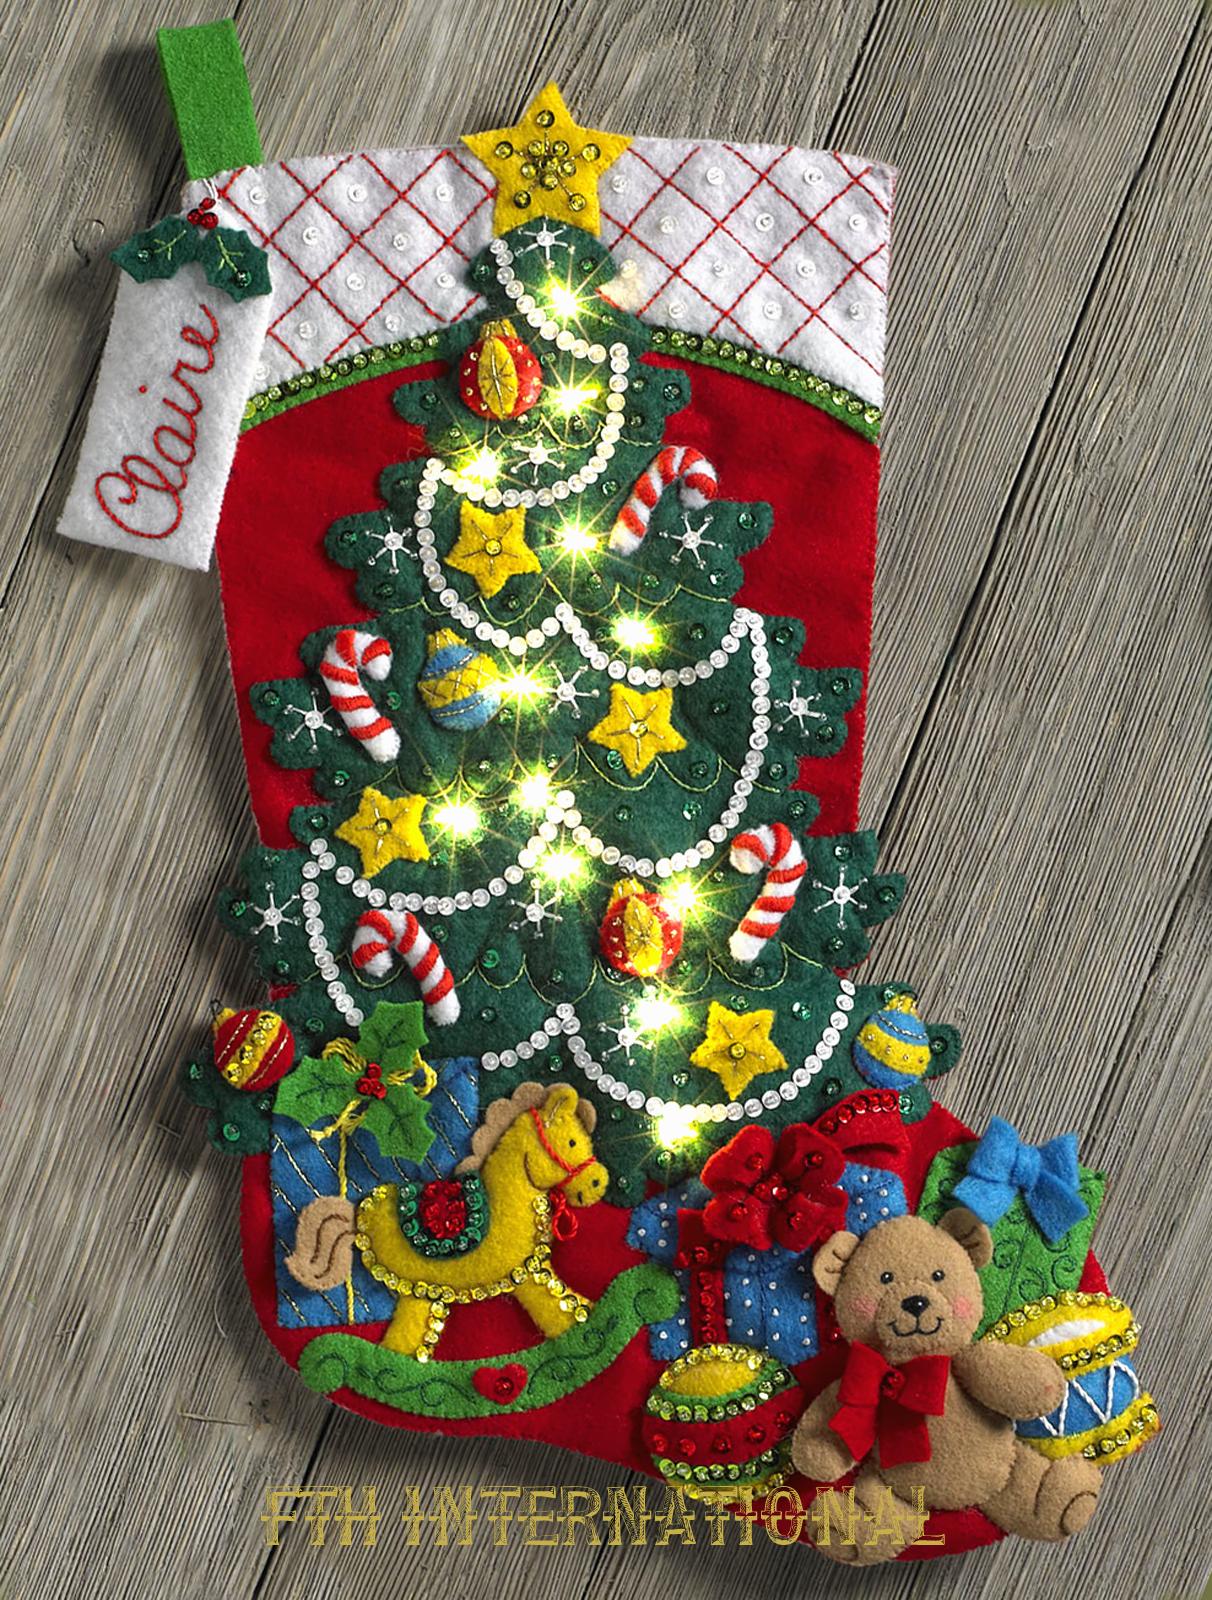 bucilla christmas tree surprise 18 felt stocking kit 86710 real lights toys - Christmas Tree Toy Decorations